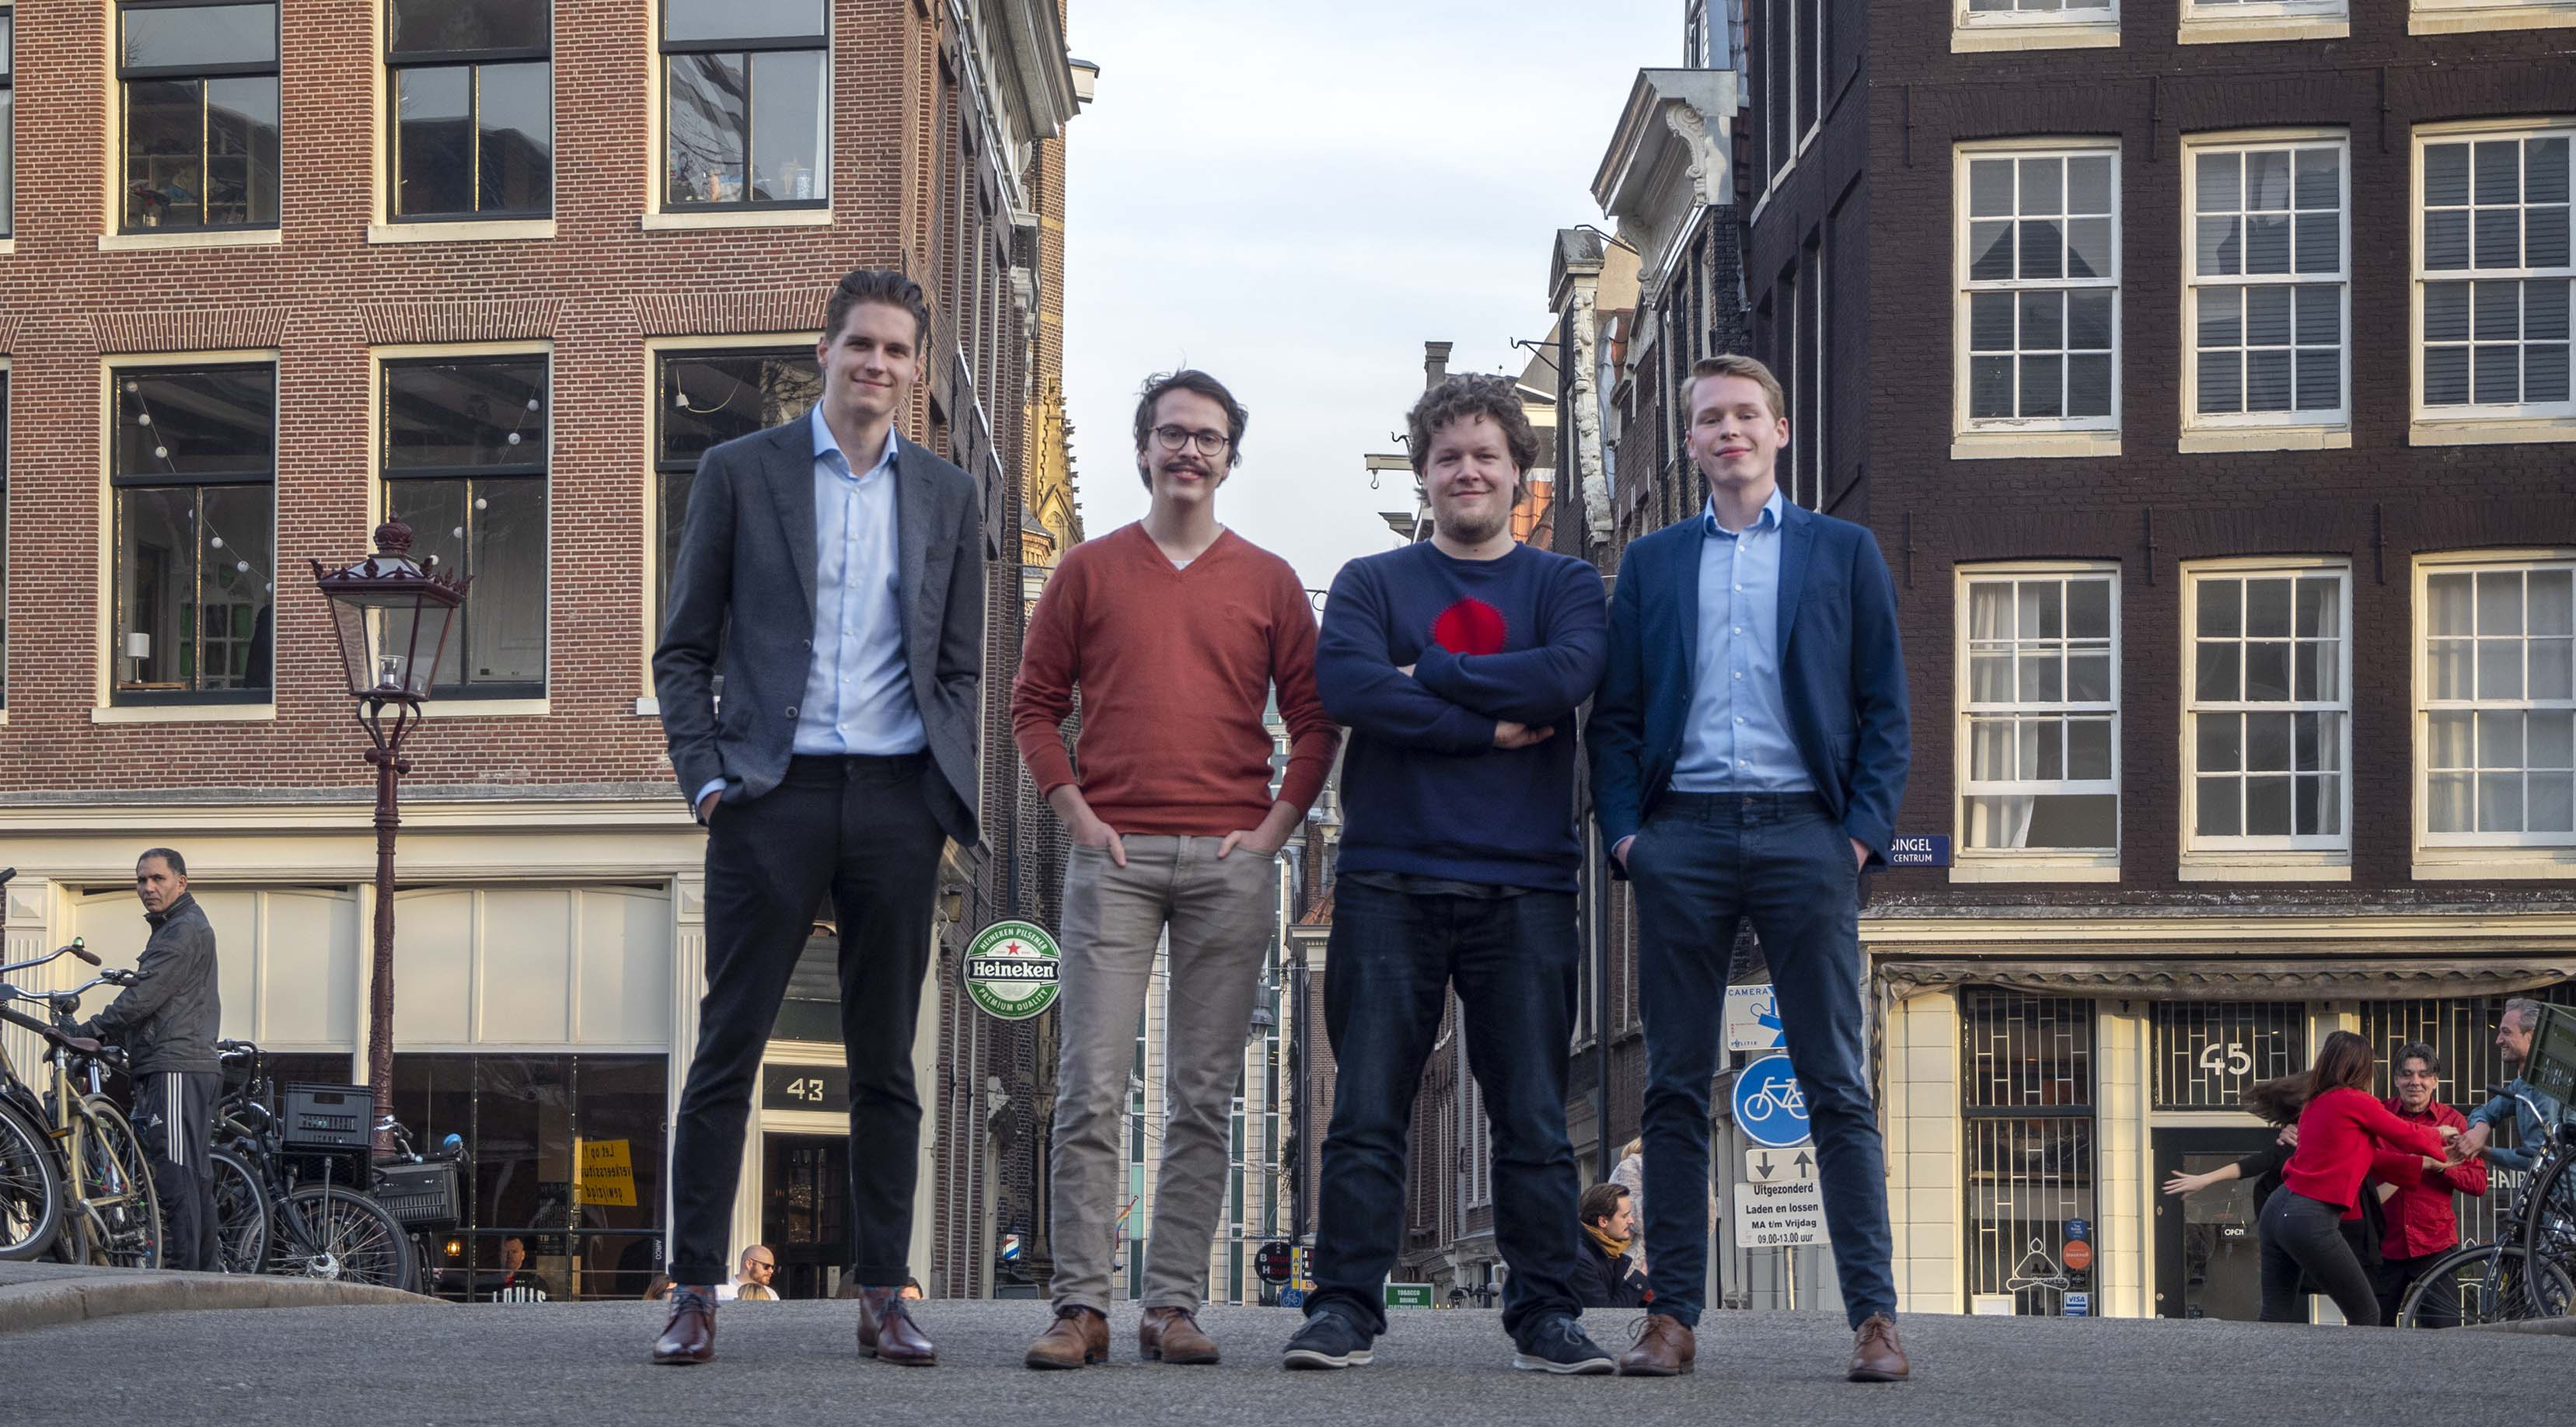 CodeGrade's founding team: Youri Voet, Thomas Schaper, Olmo Kramer and Devin Hillenius